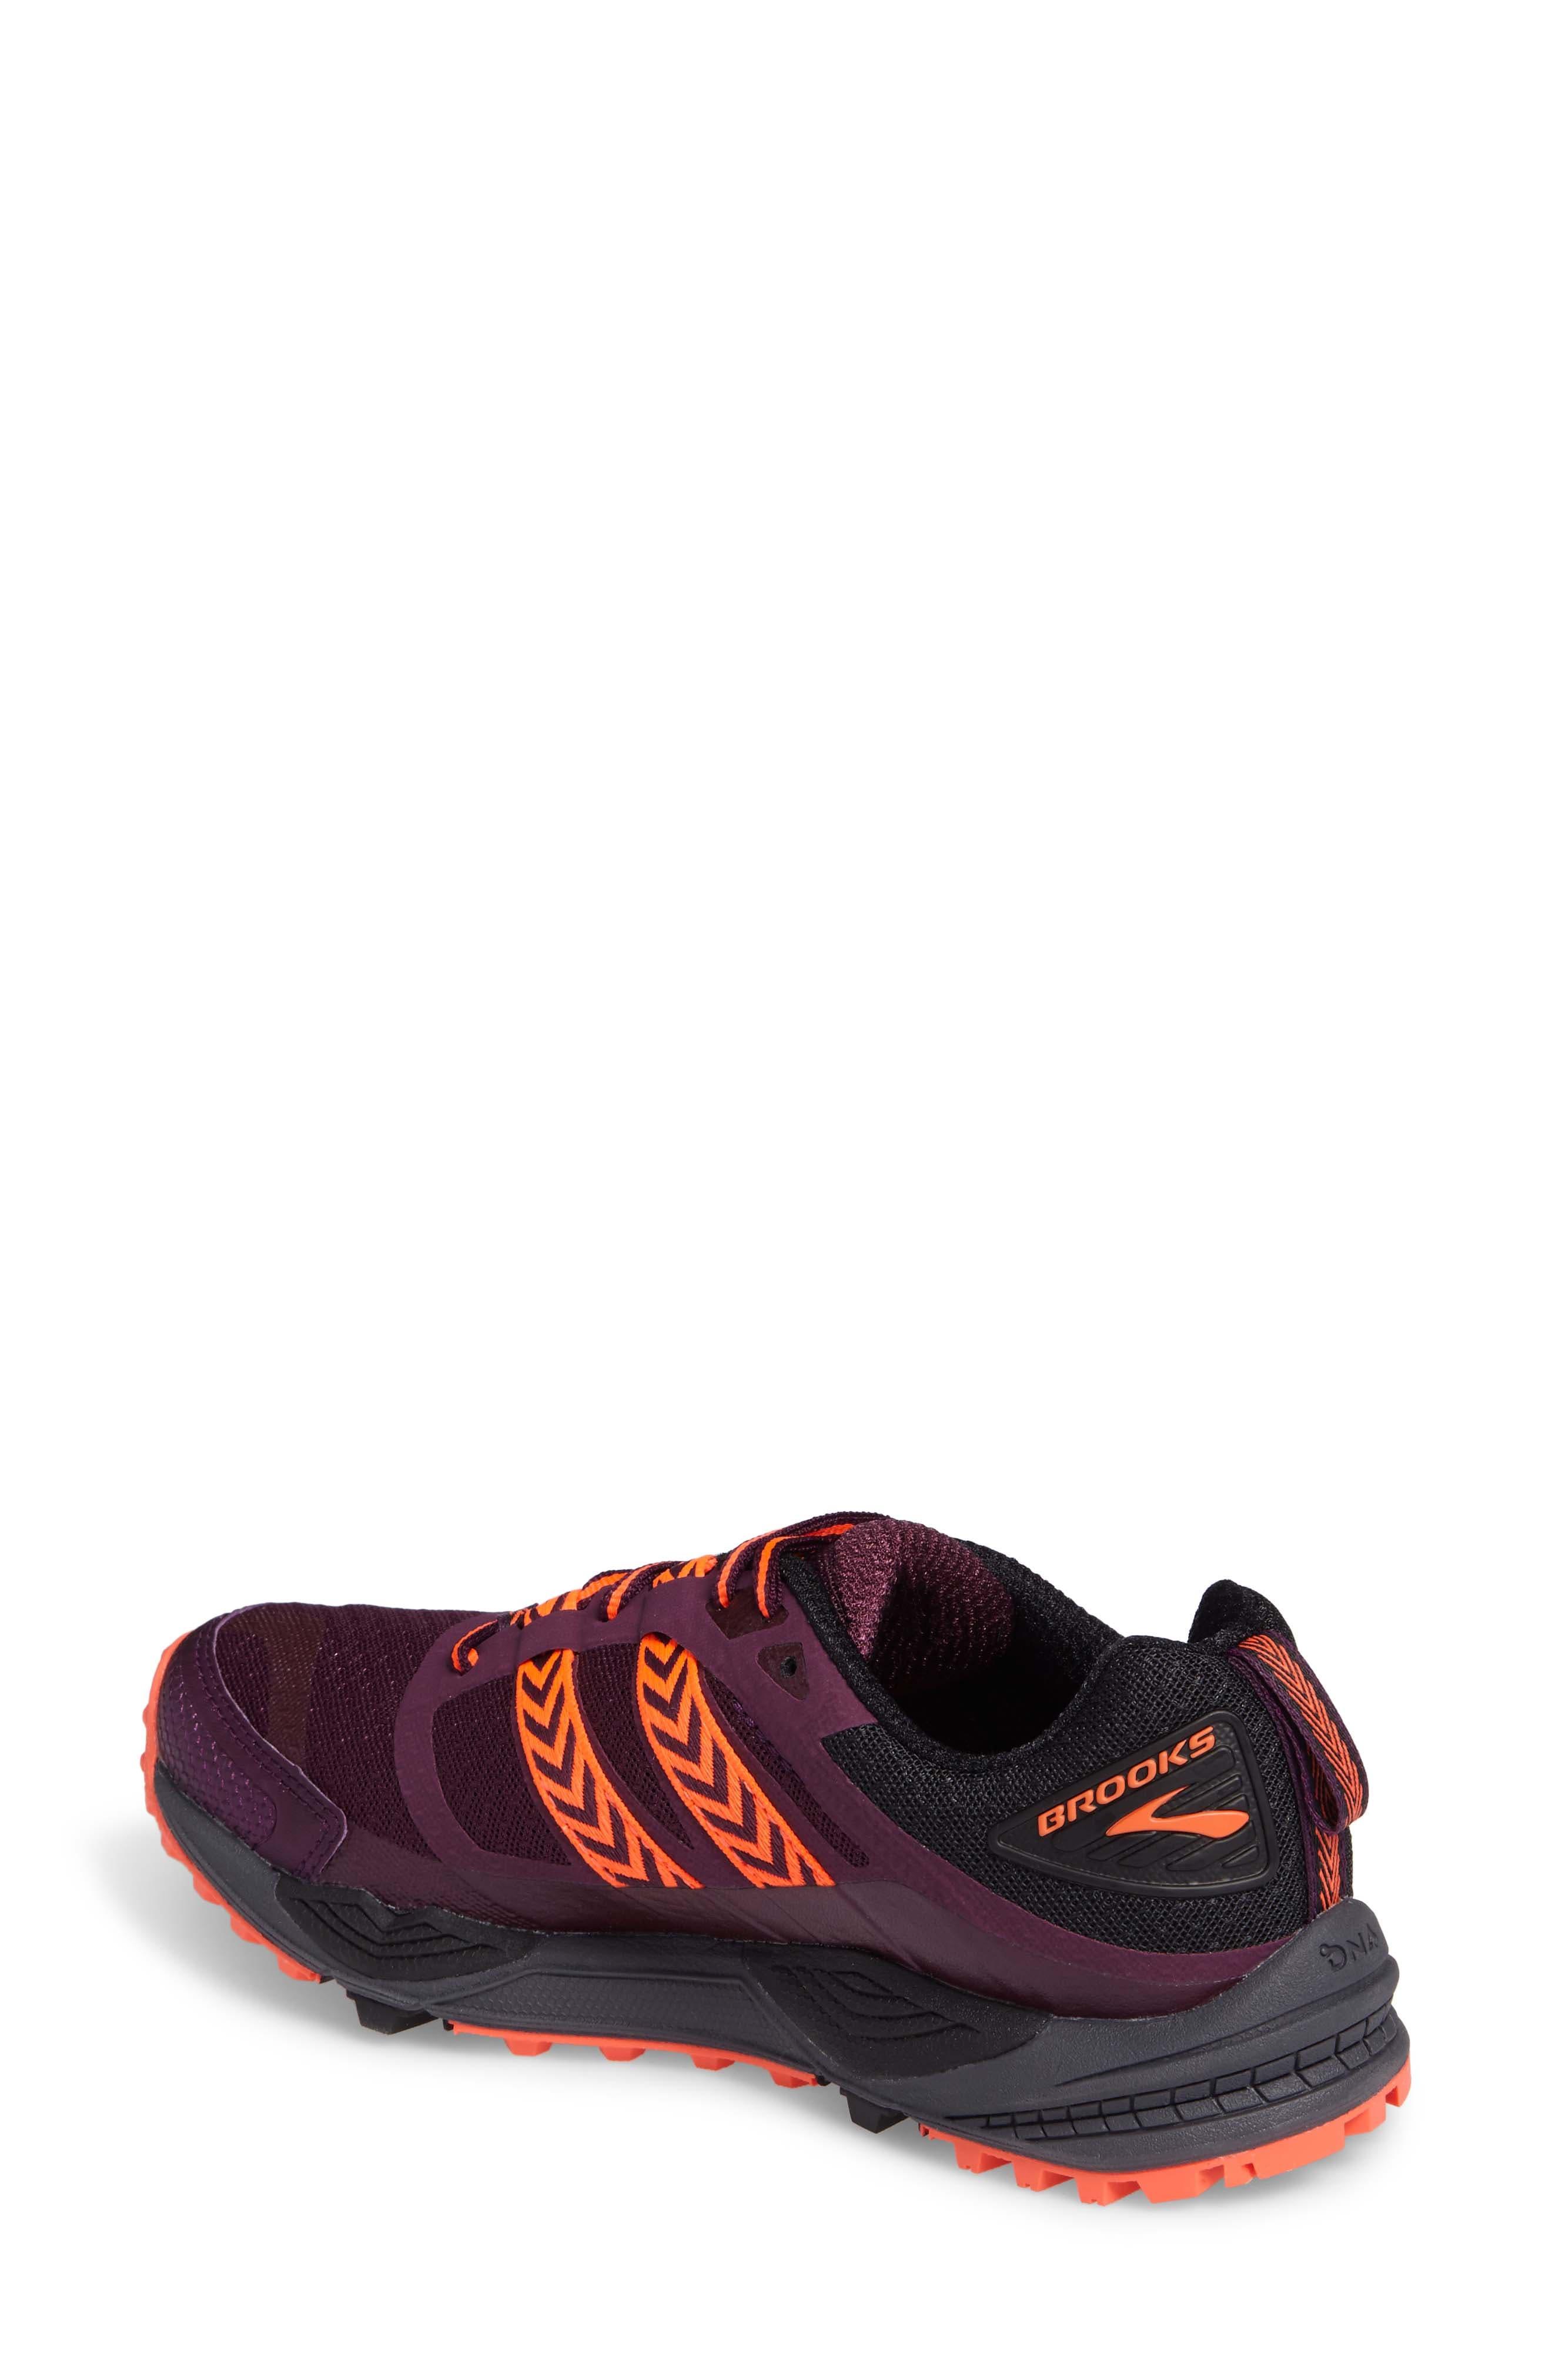 Alternate Image 2  - Brooks Cascadia 12 Trail Running Shoe (Women)